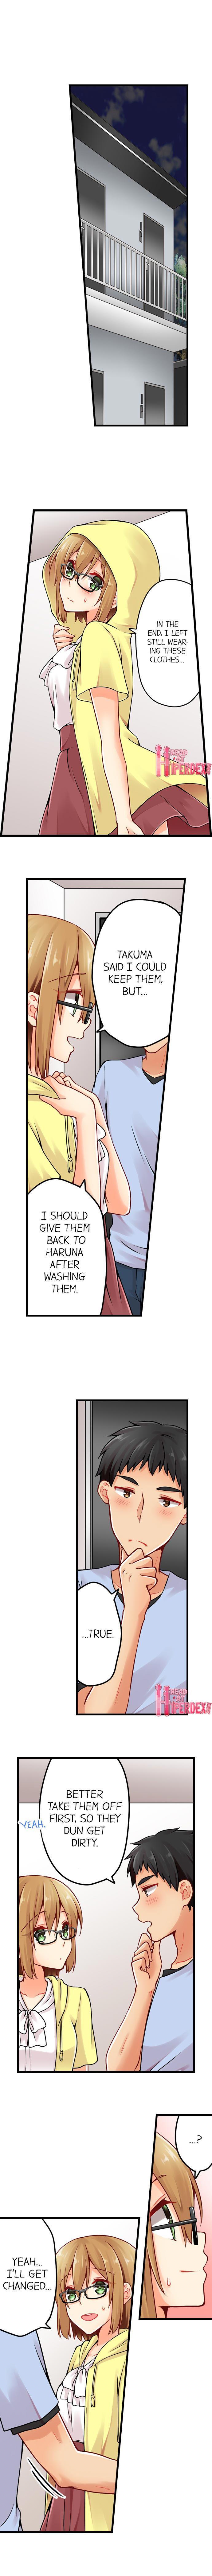 Ren Arisugawa Is Actually A Girl 692